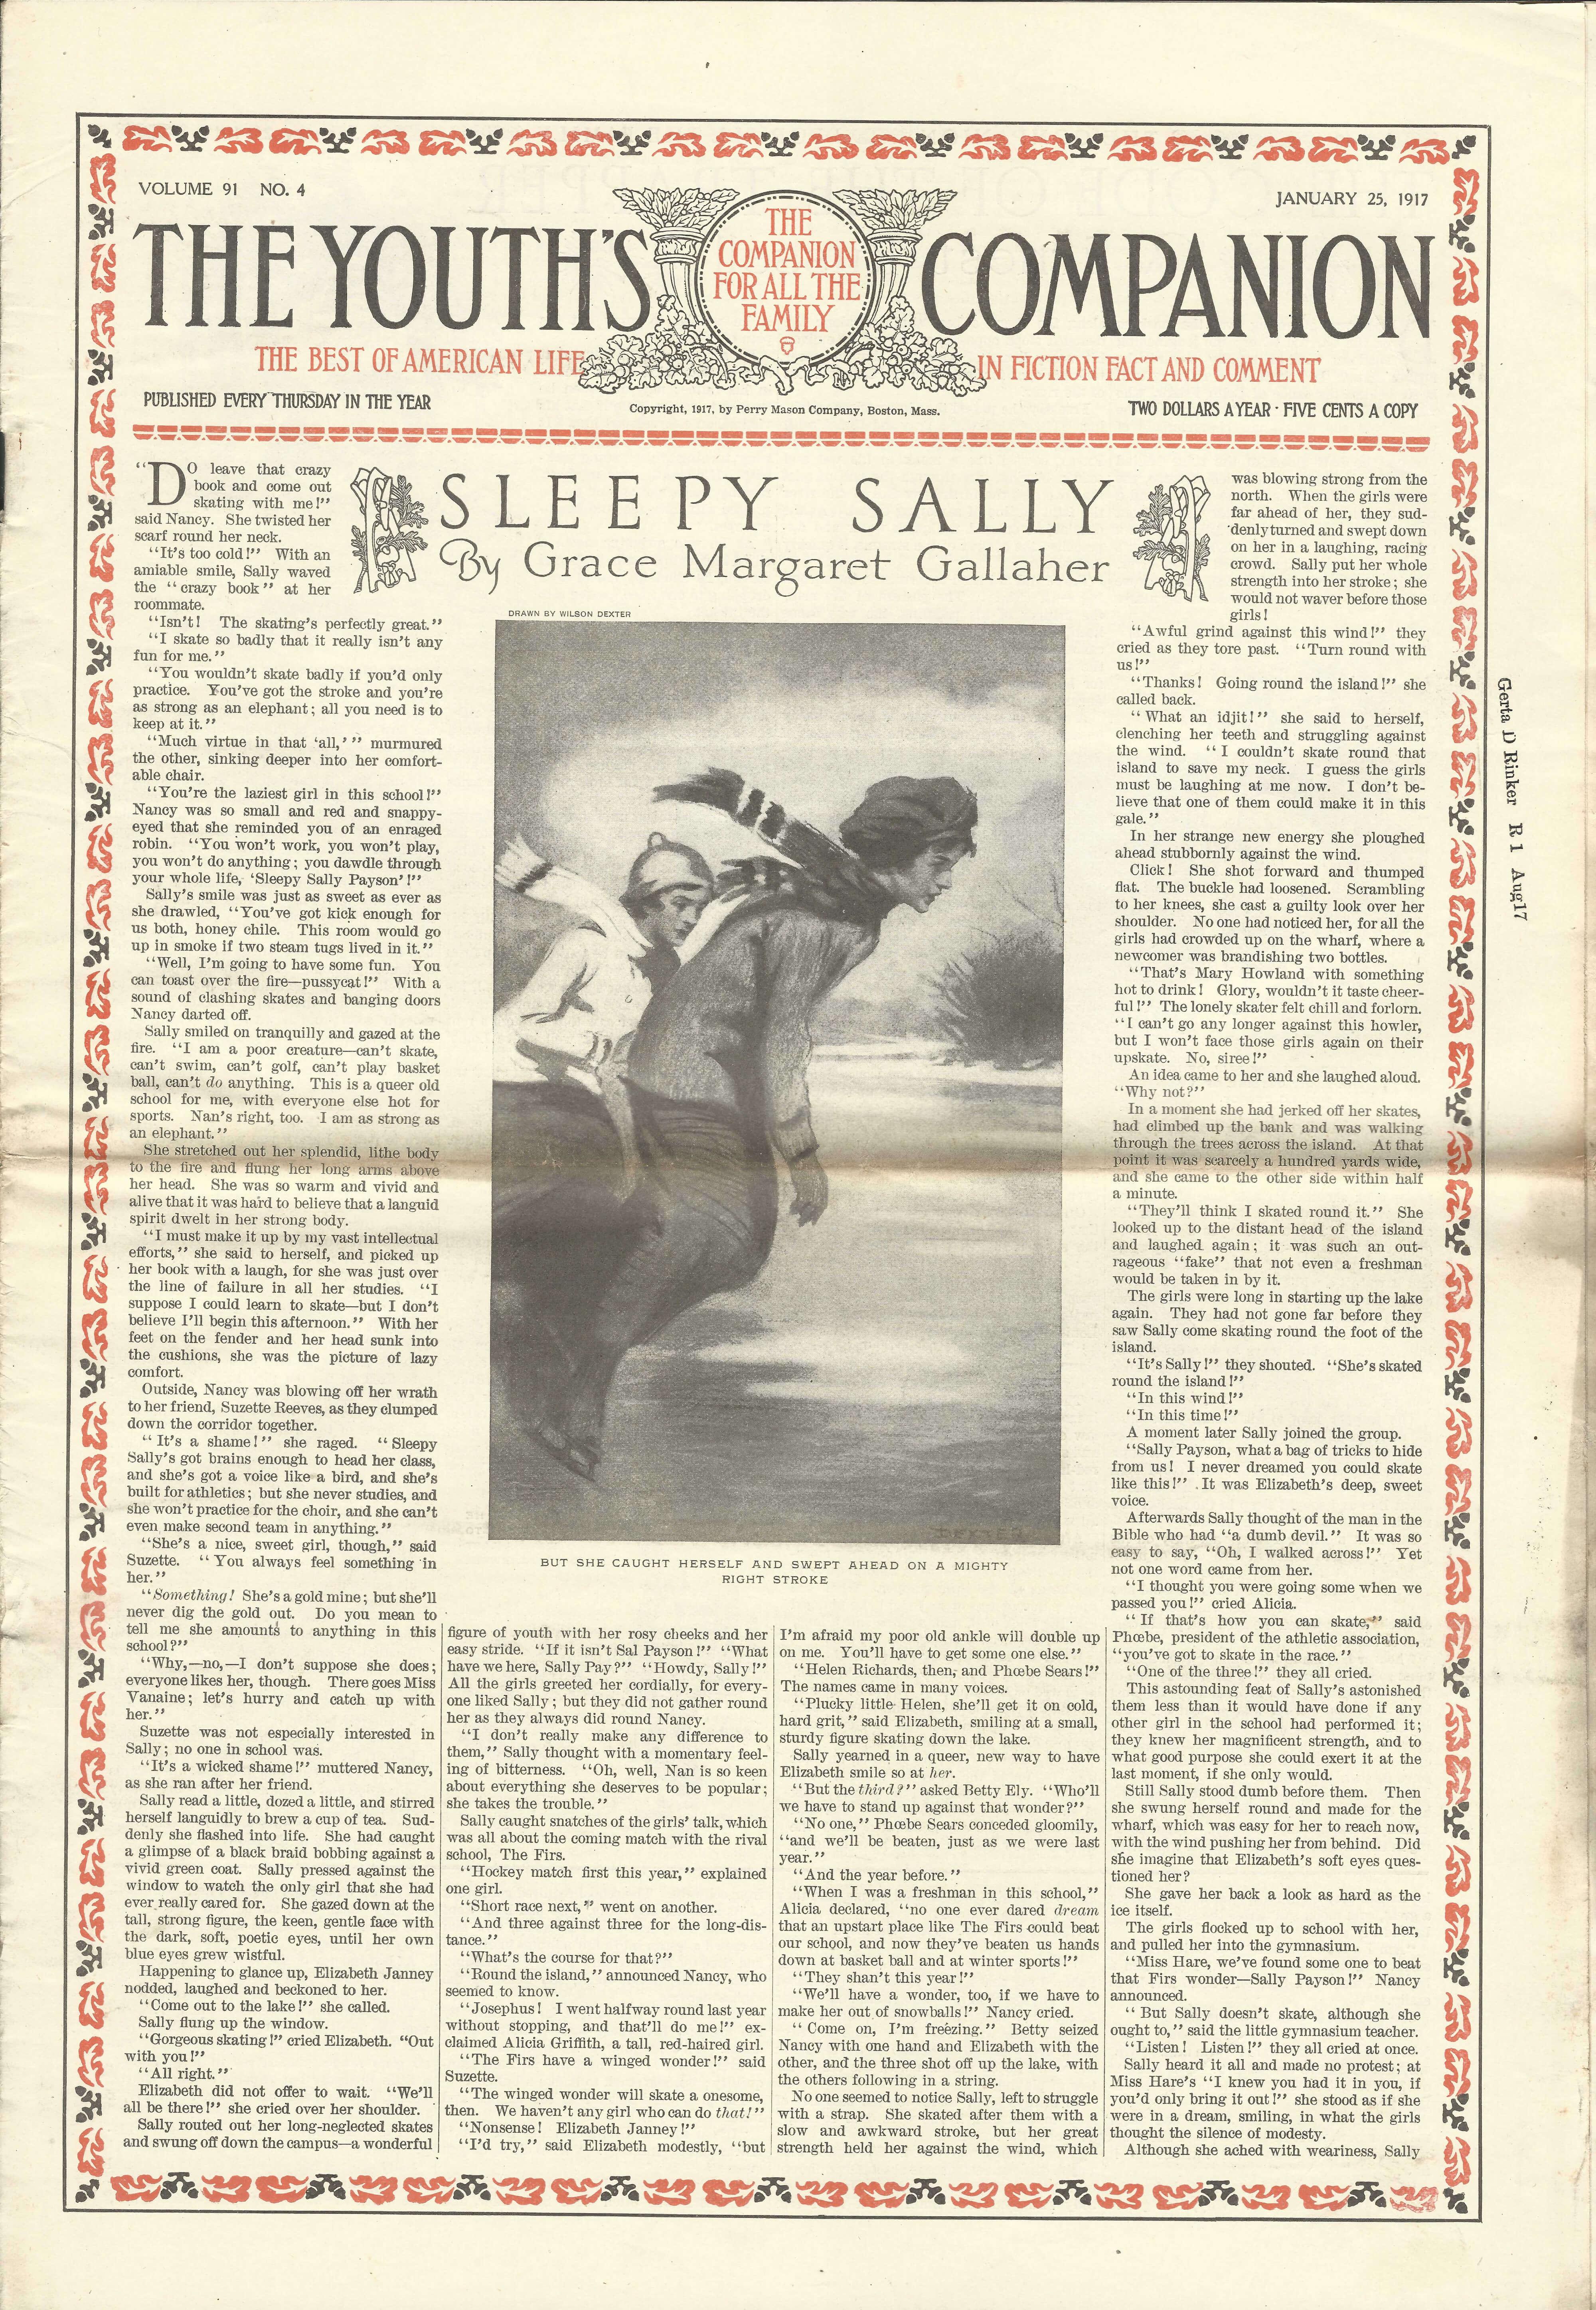 January 25 1917